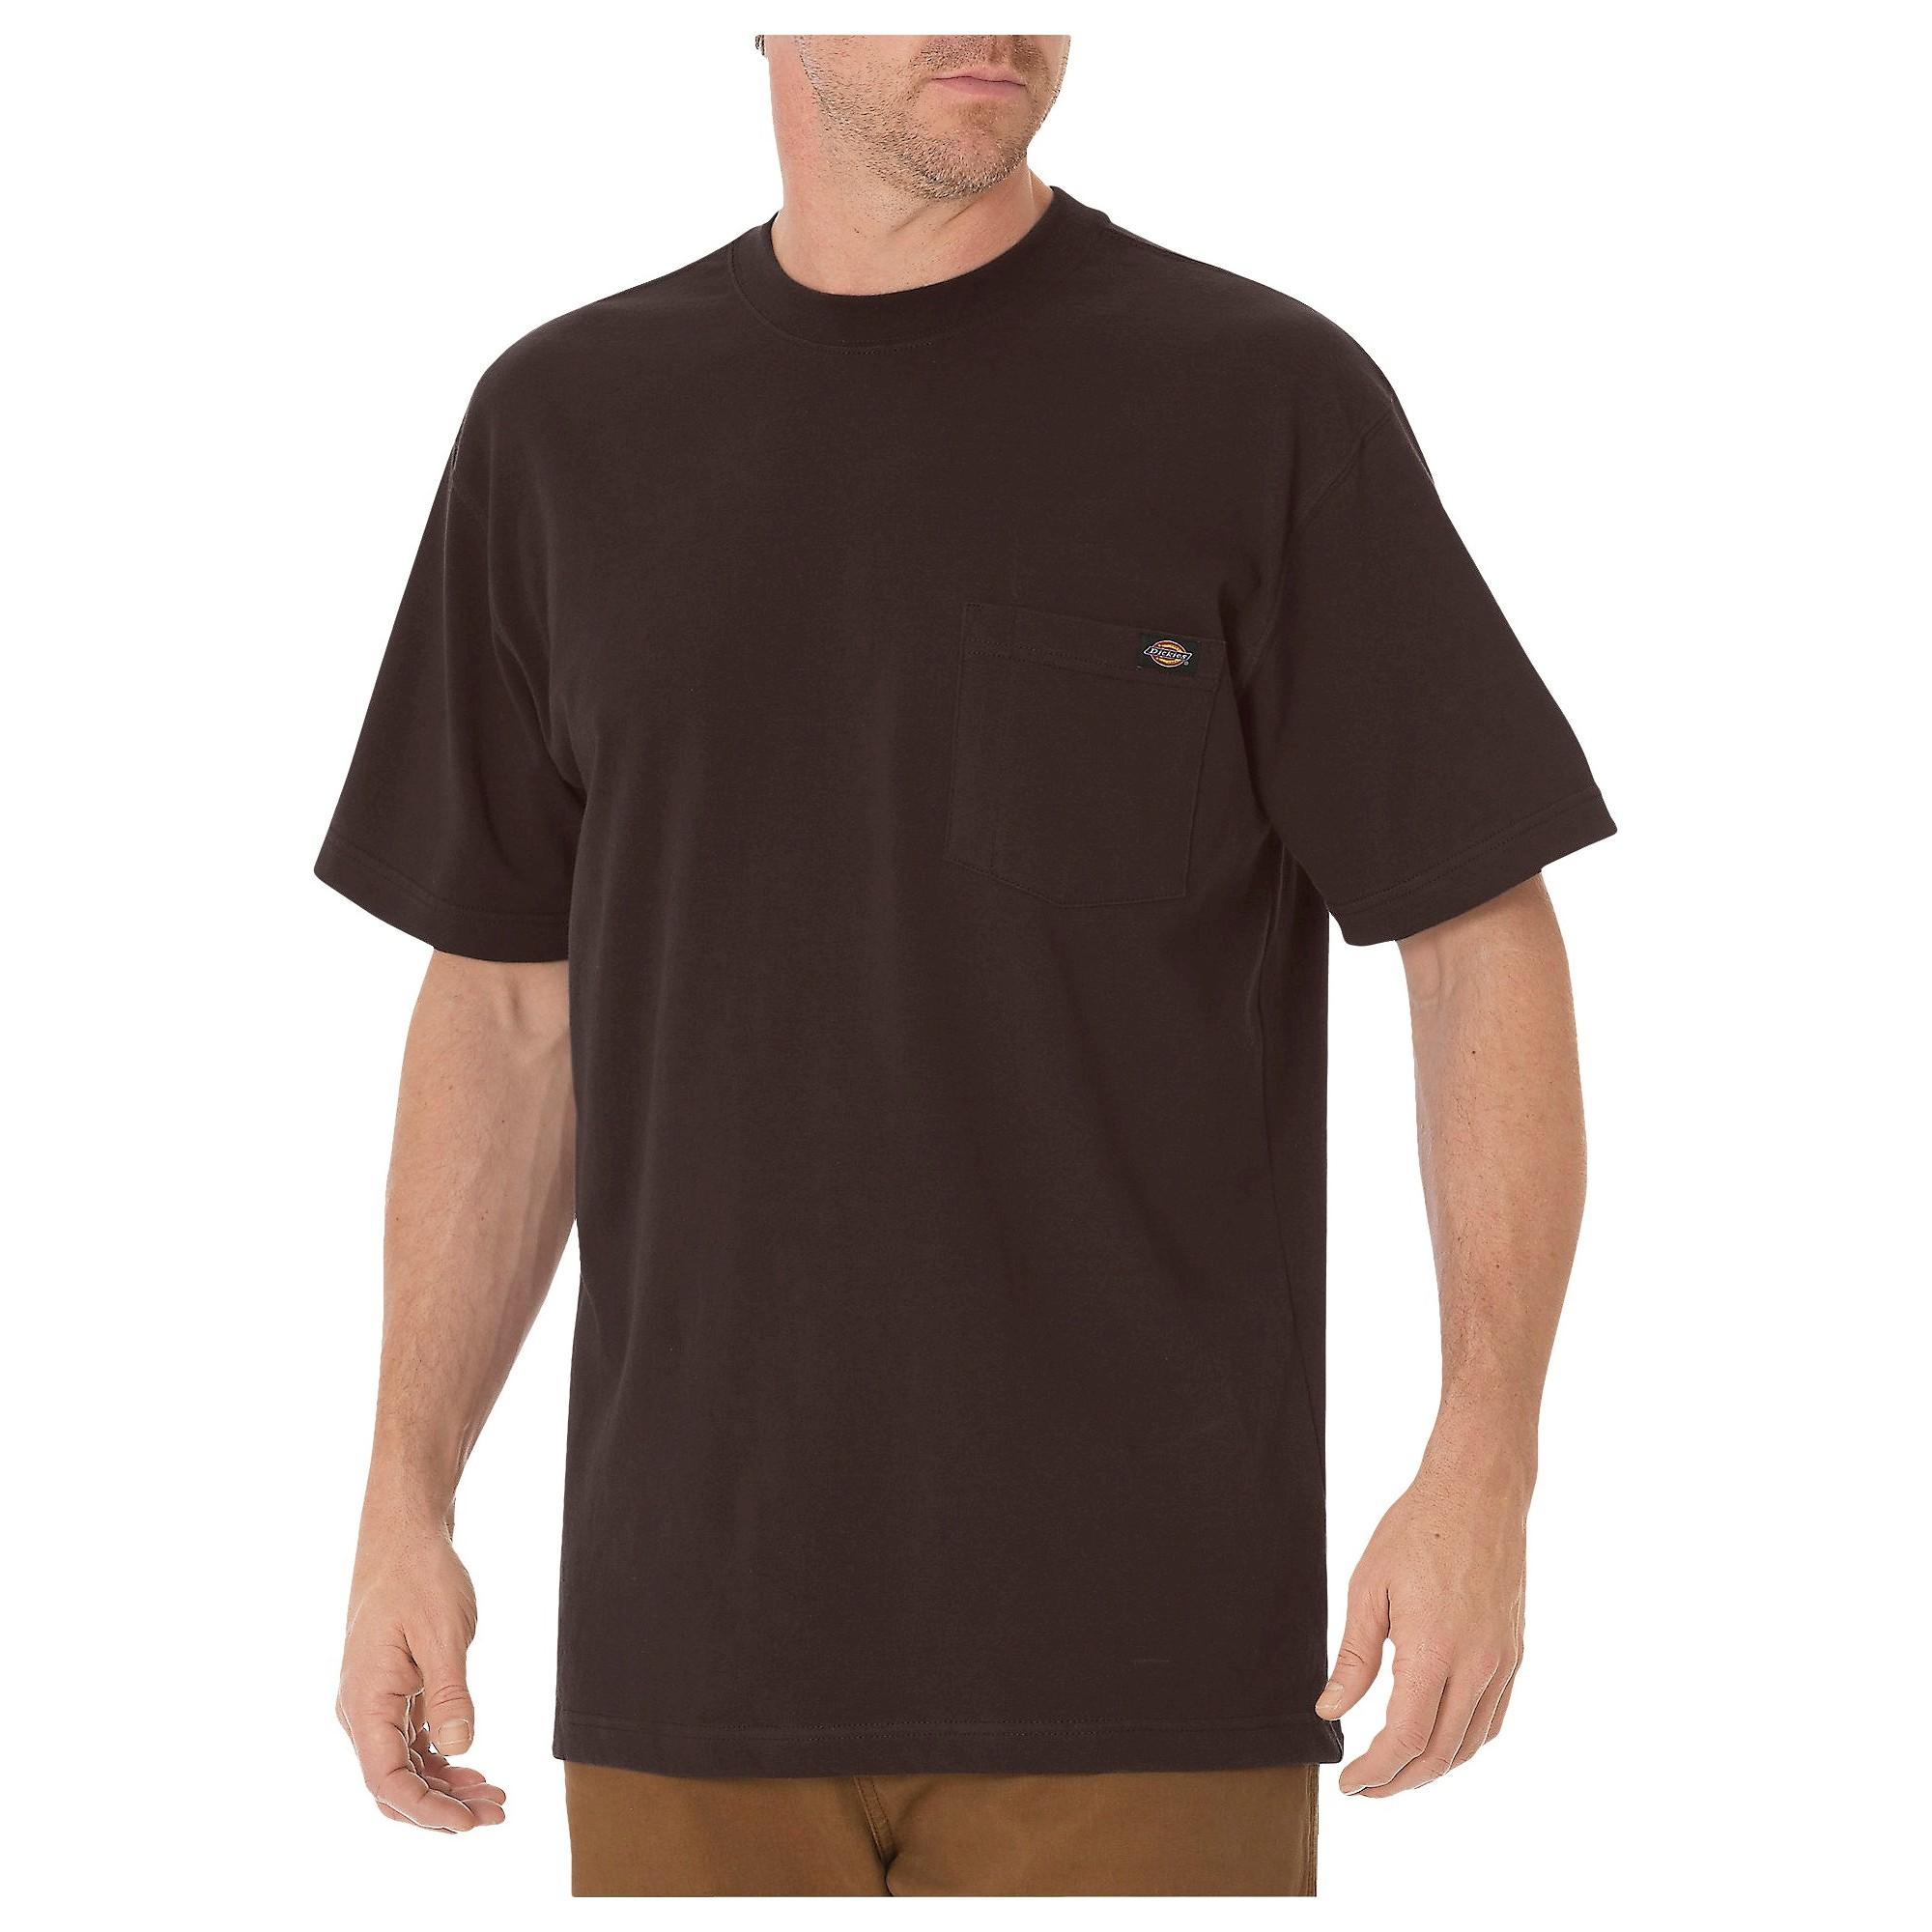 a93bbb733d8d54 Dickies Men s Big   Tall Cotton Heavyweight Short Sleeve Pocket T-Shirt-  Chocolate Brown L Tall